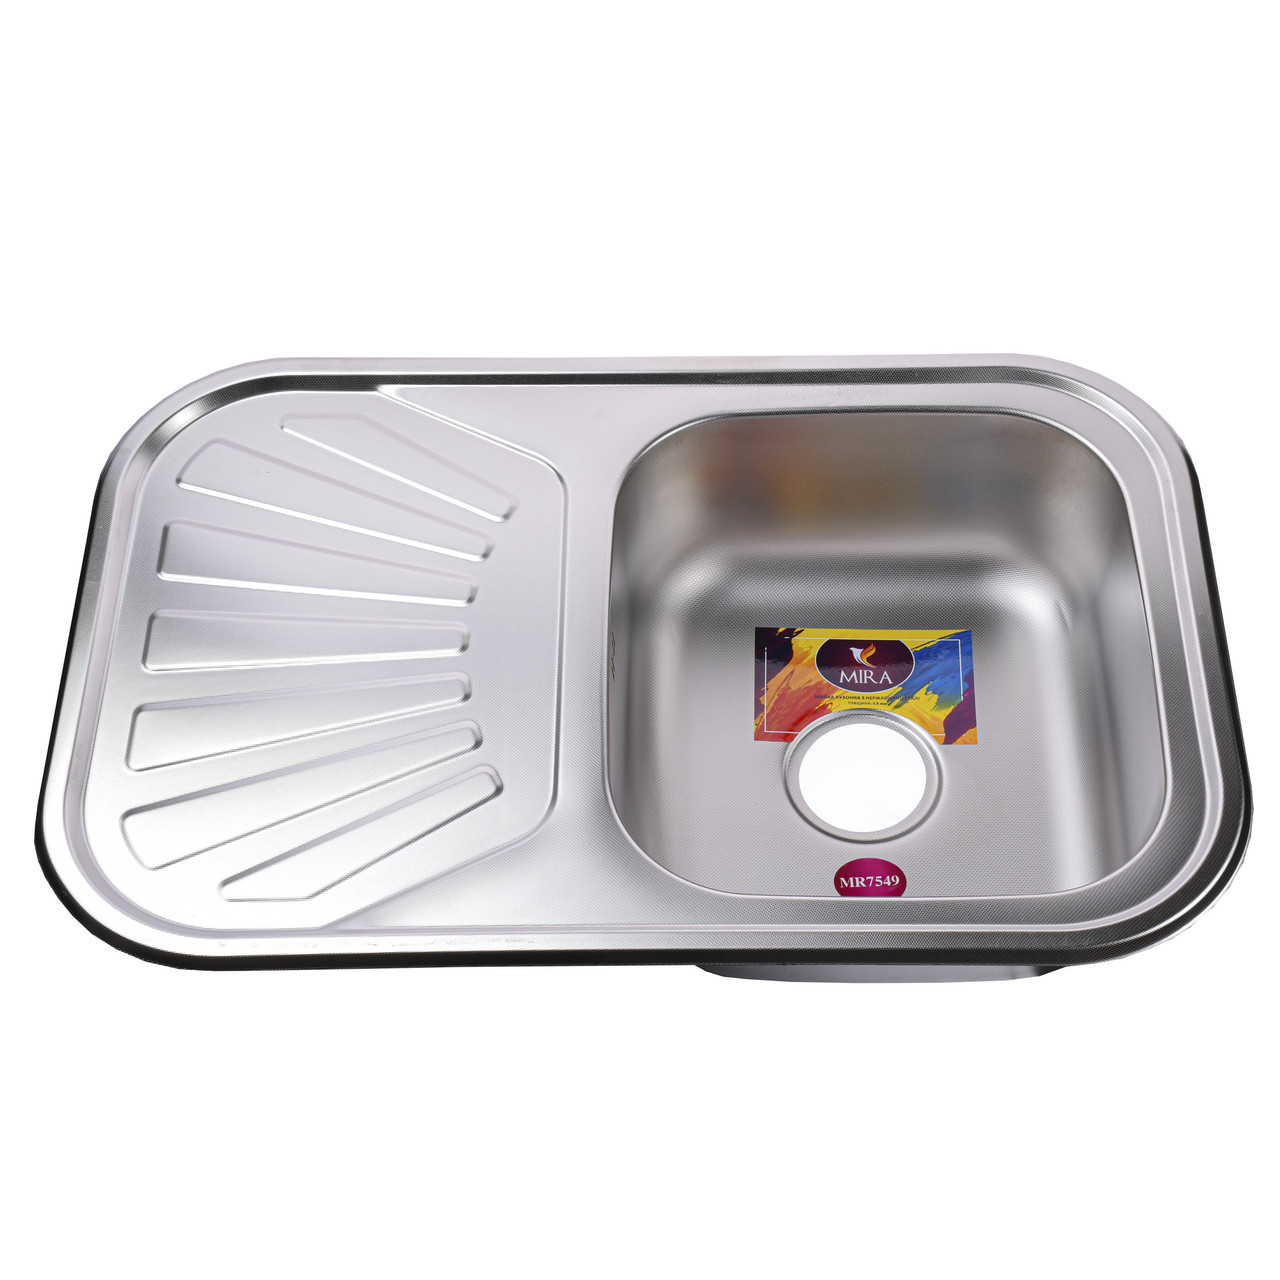 Мойка кухонная Mira MR 7549 D Decor